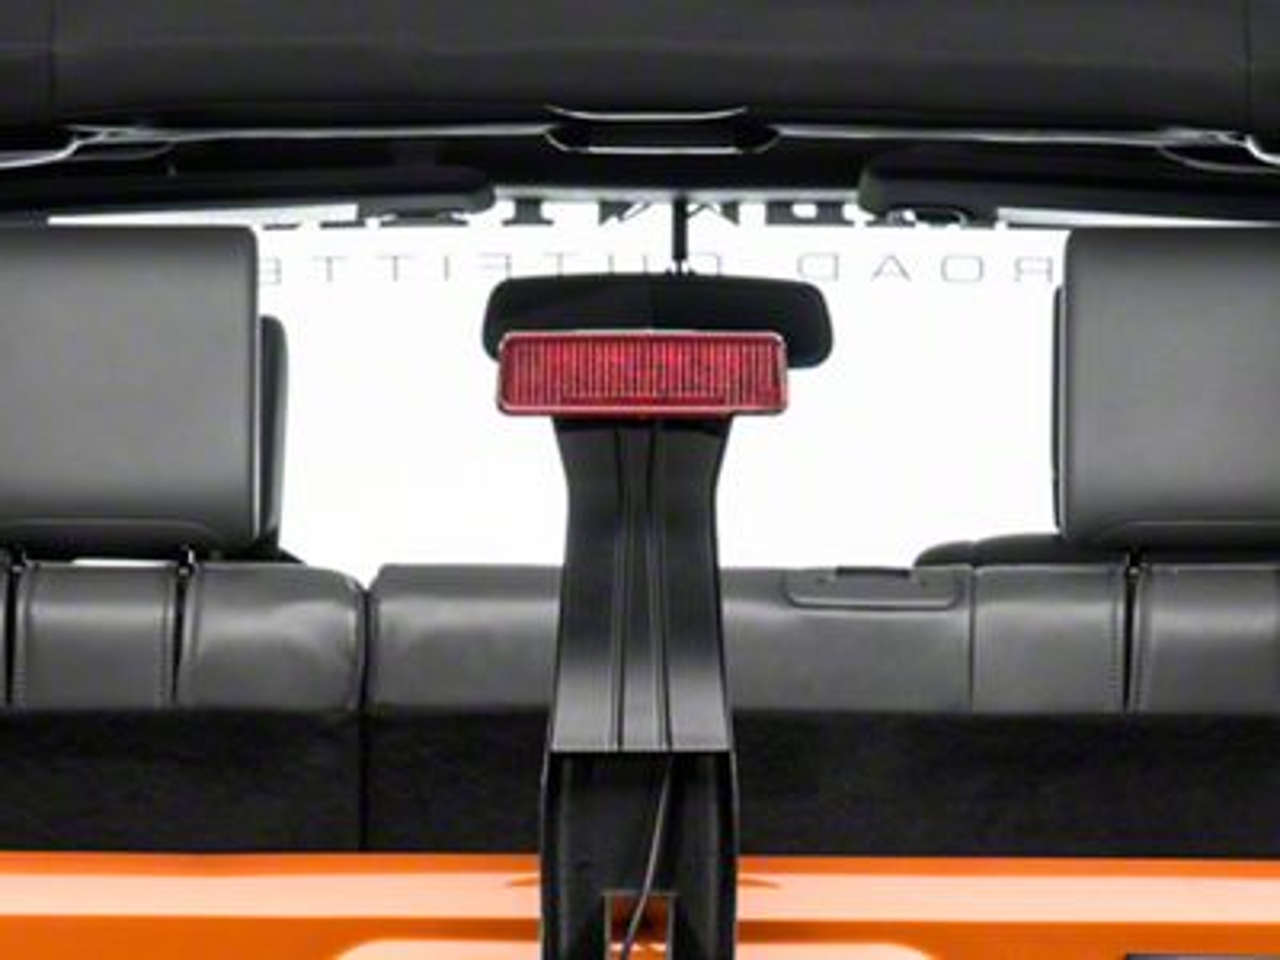 GraBars Adjustable LED Third Brake Light (87-18 Jeep Wrangler YJ, TJ & JK)